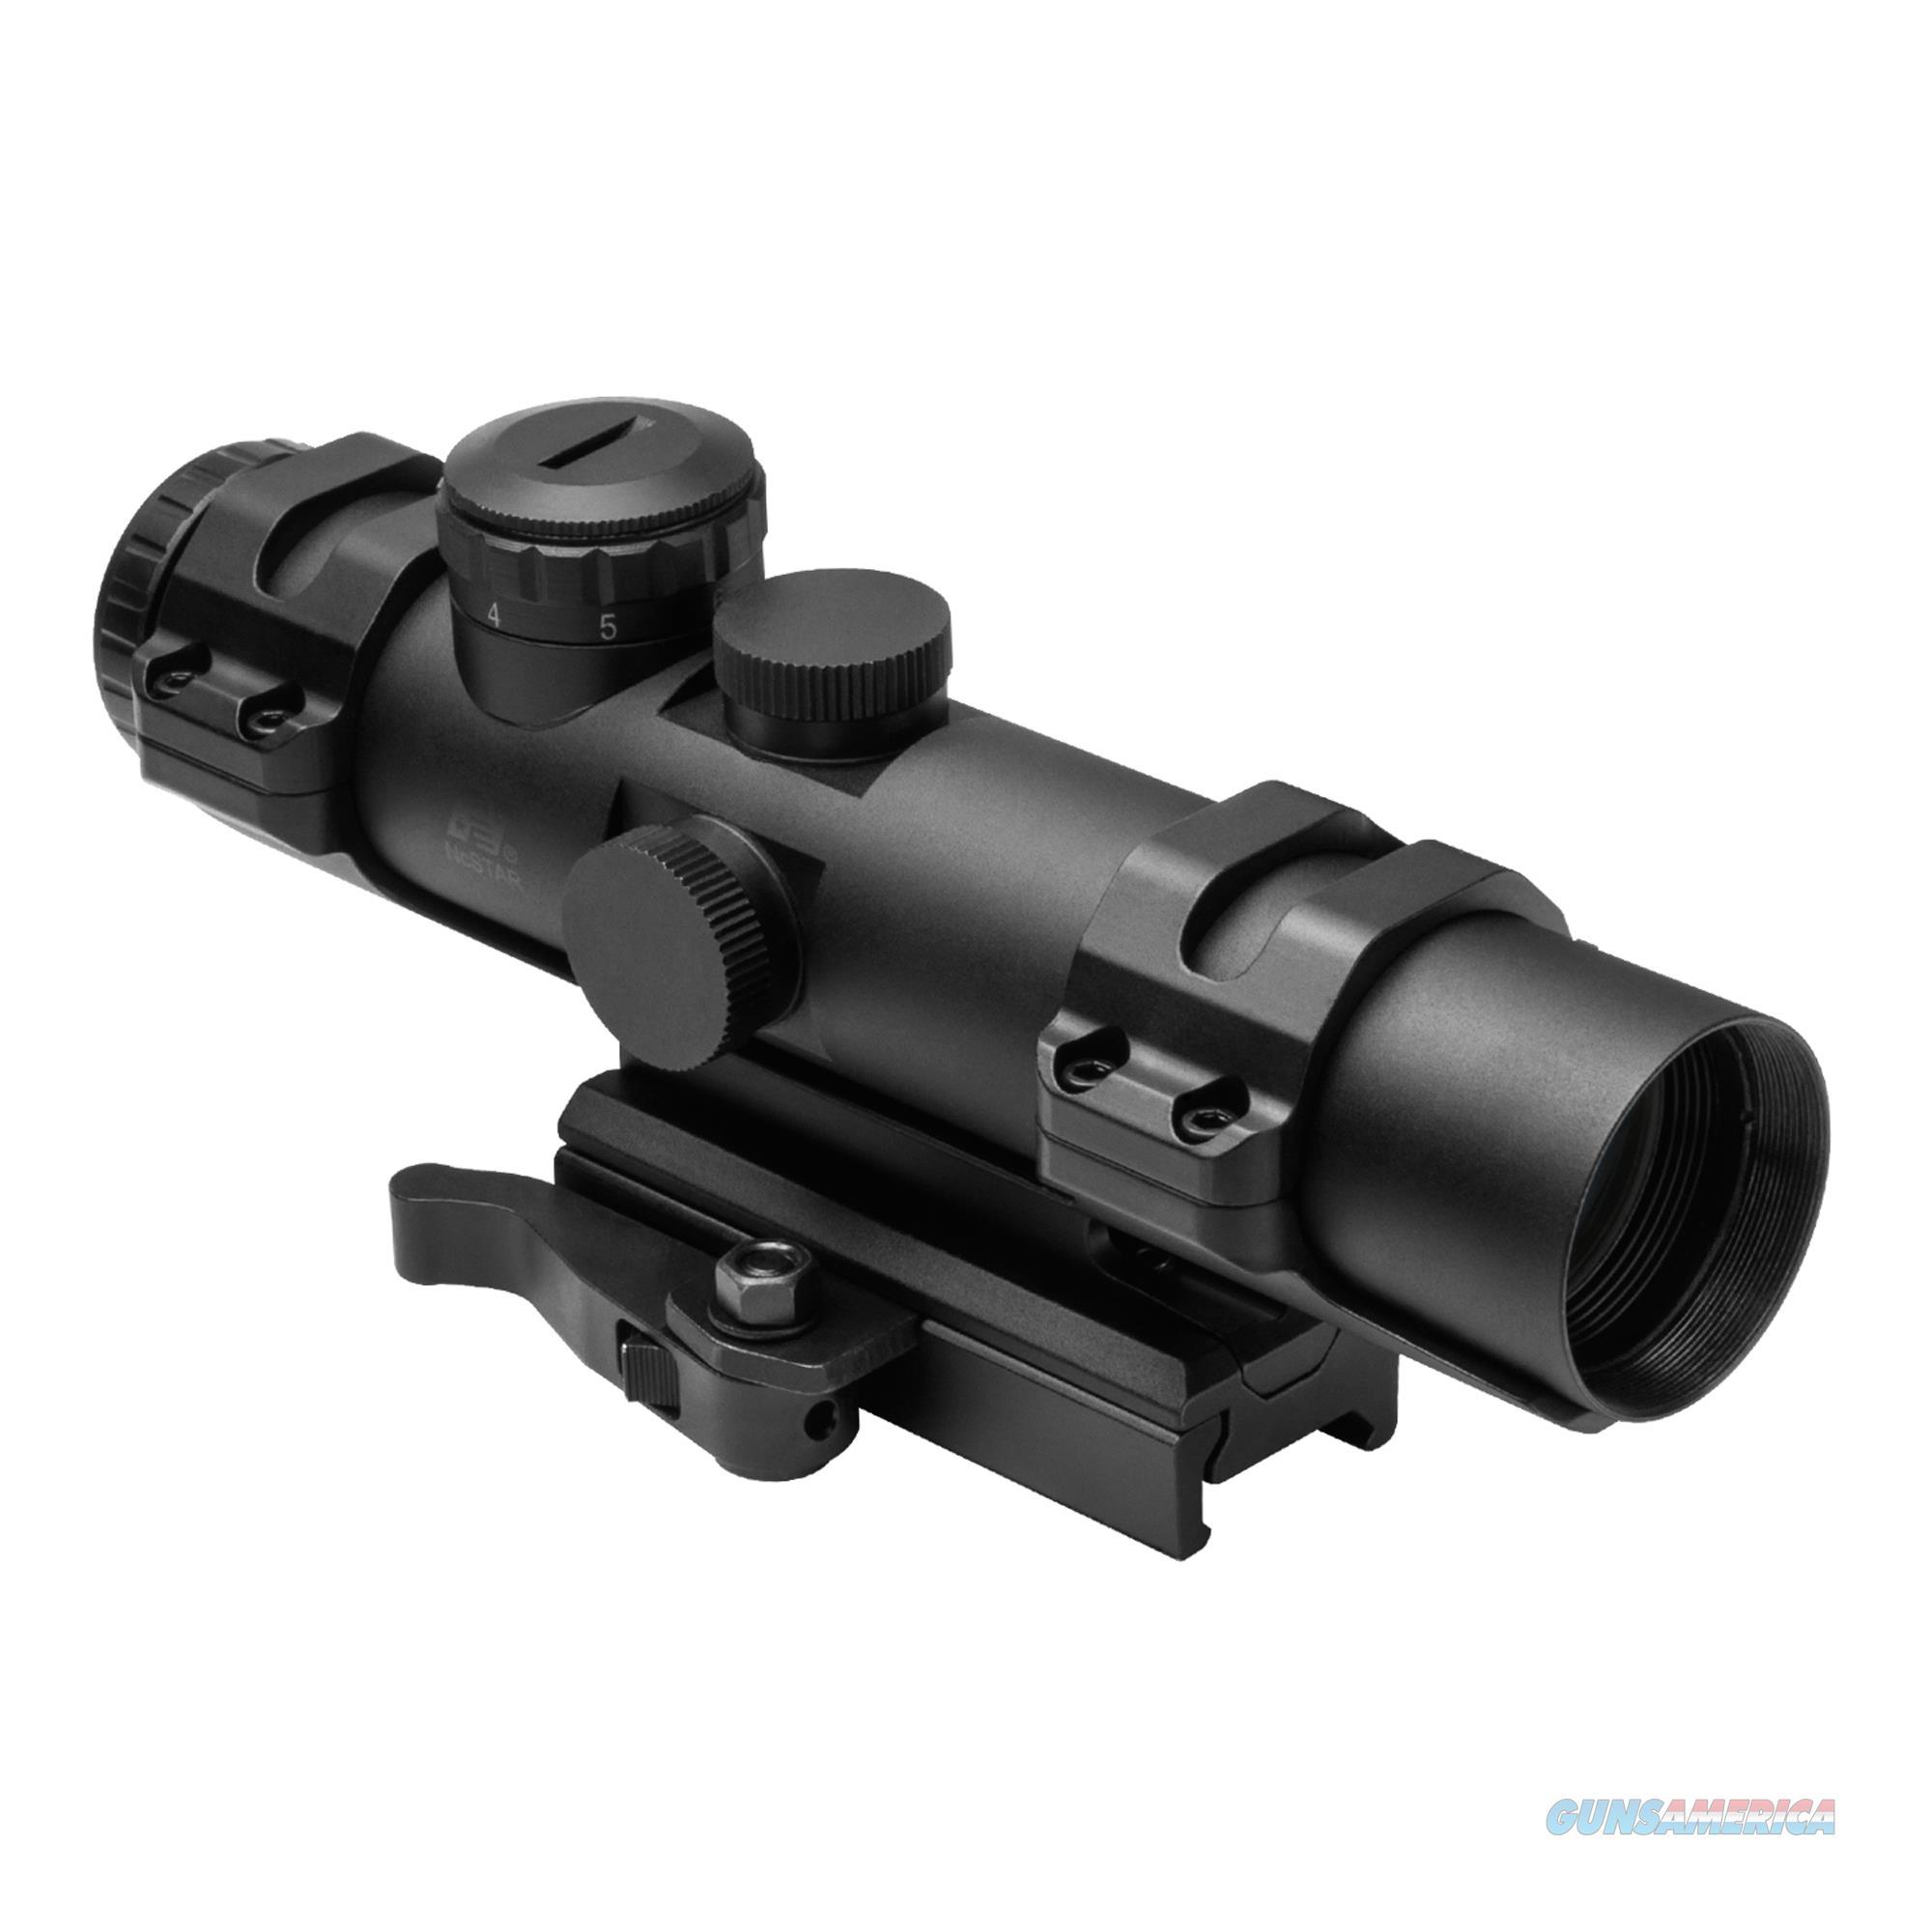 Nc Star Xrs Series Scope SECXRSM2732G  Non-Guns > Scopes/Mounts/Rings & Optics > Rifle Scopes > Variable Focal Length